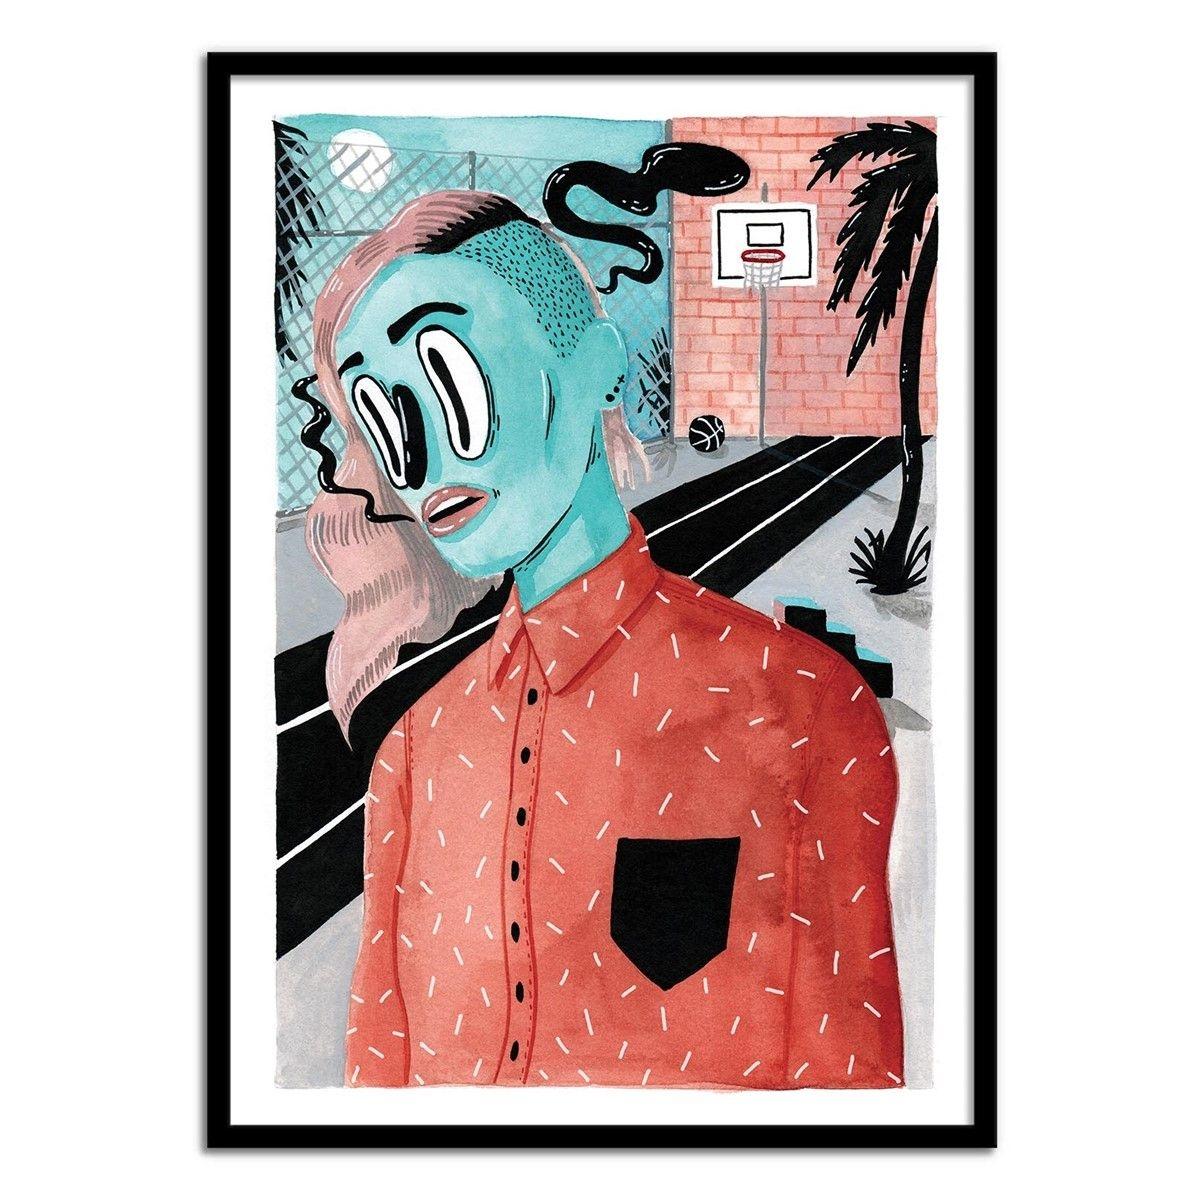 wall editions affiche art 50x70 cm girl portrait street art illustration shoppingscanner. Black Bedroom Furniture Sets. Home Design Ideas